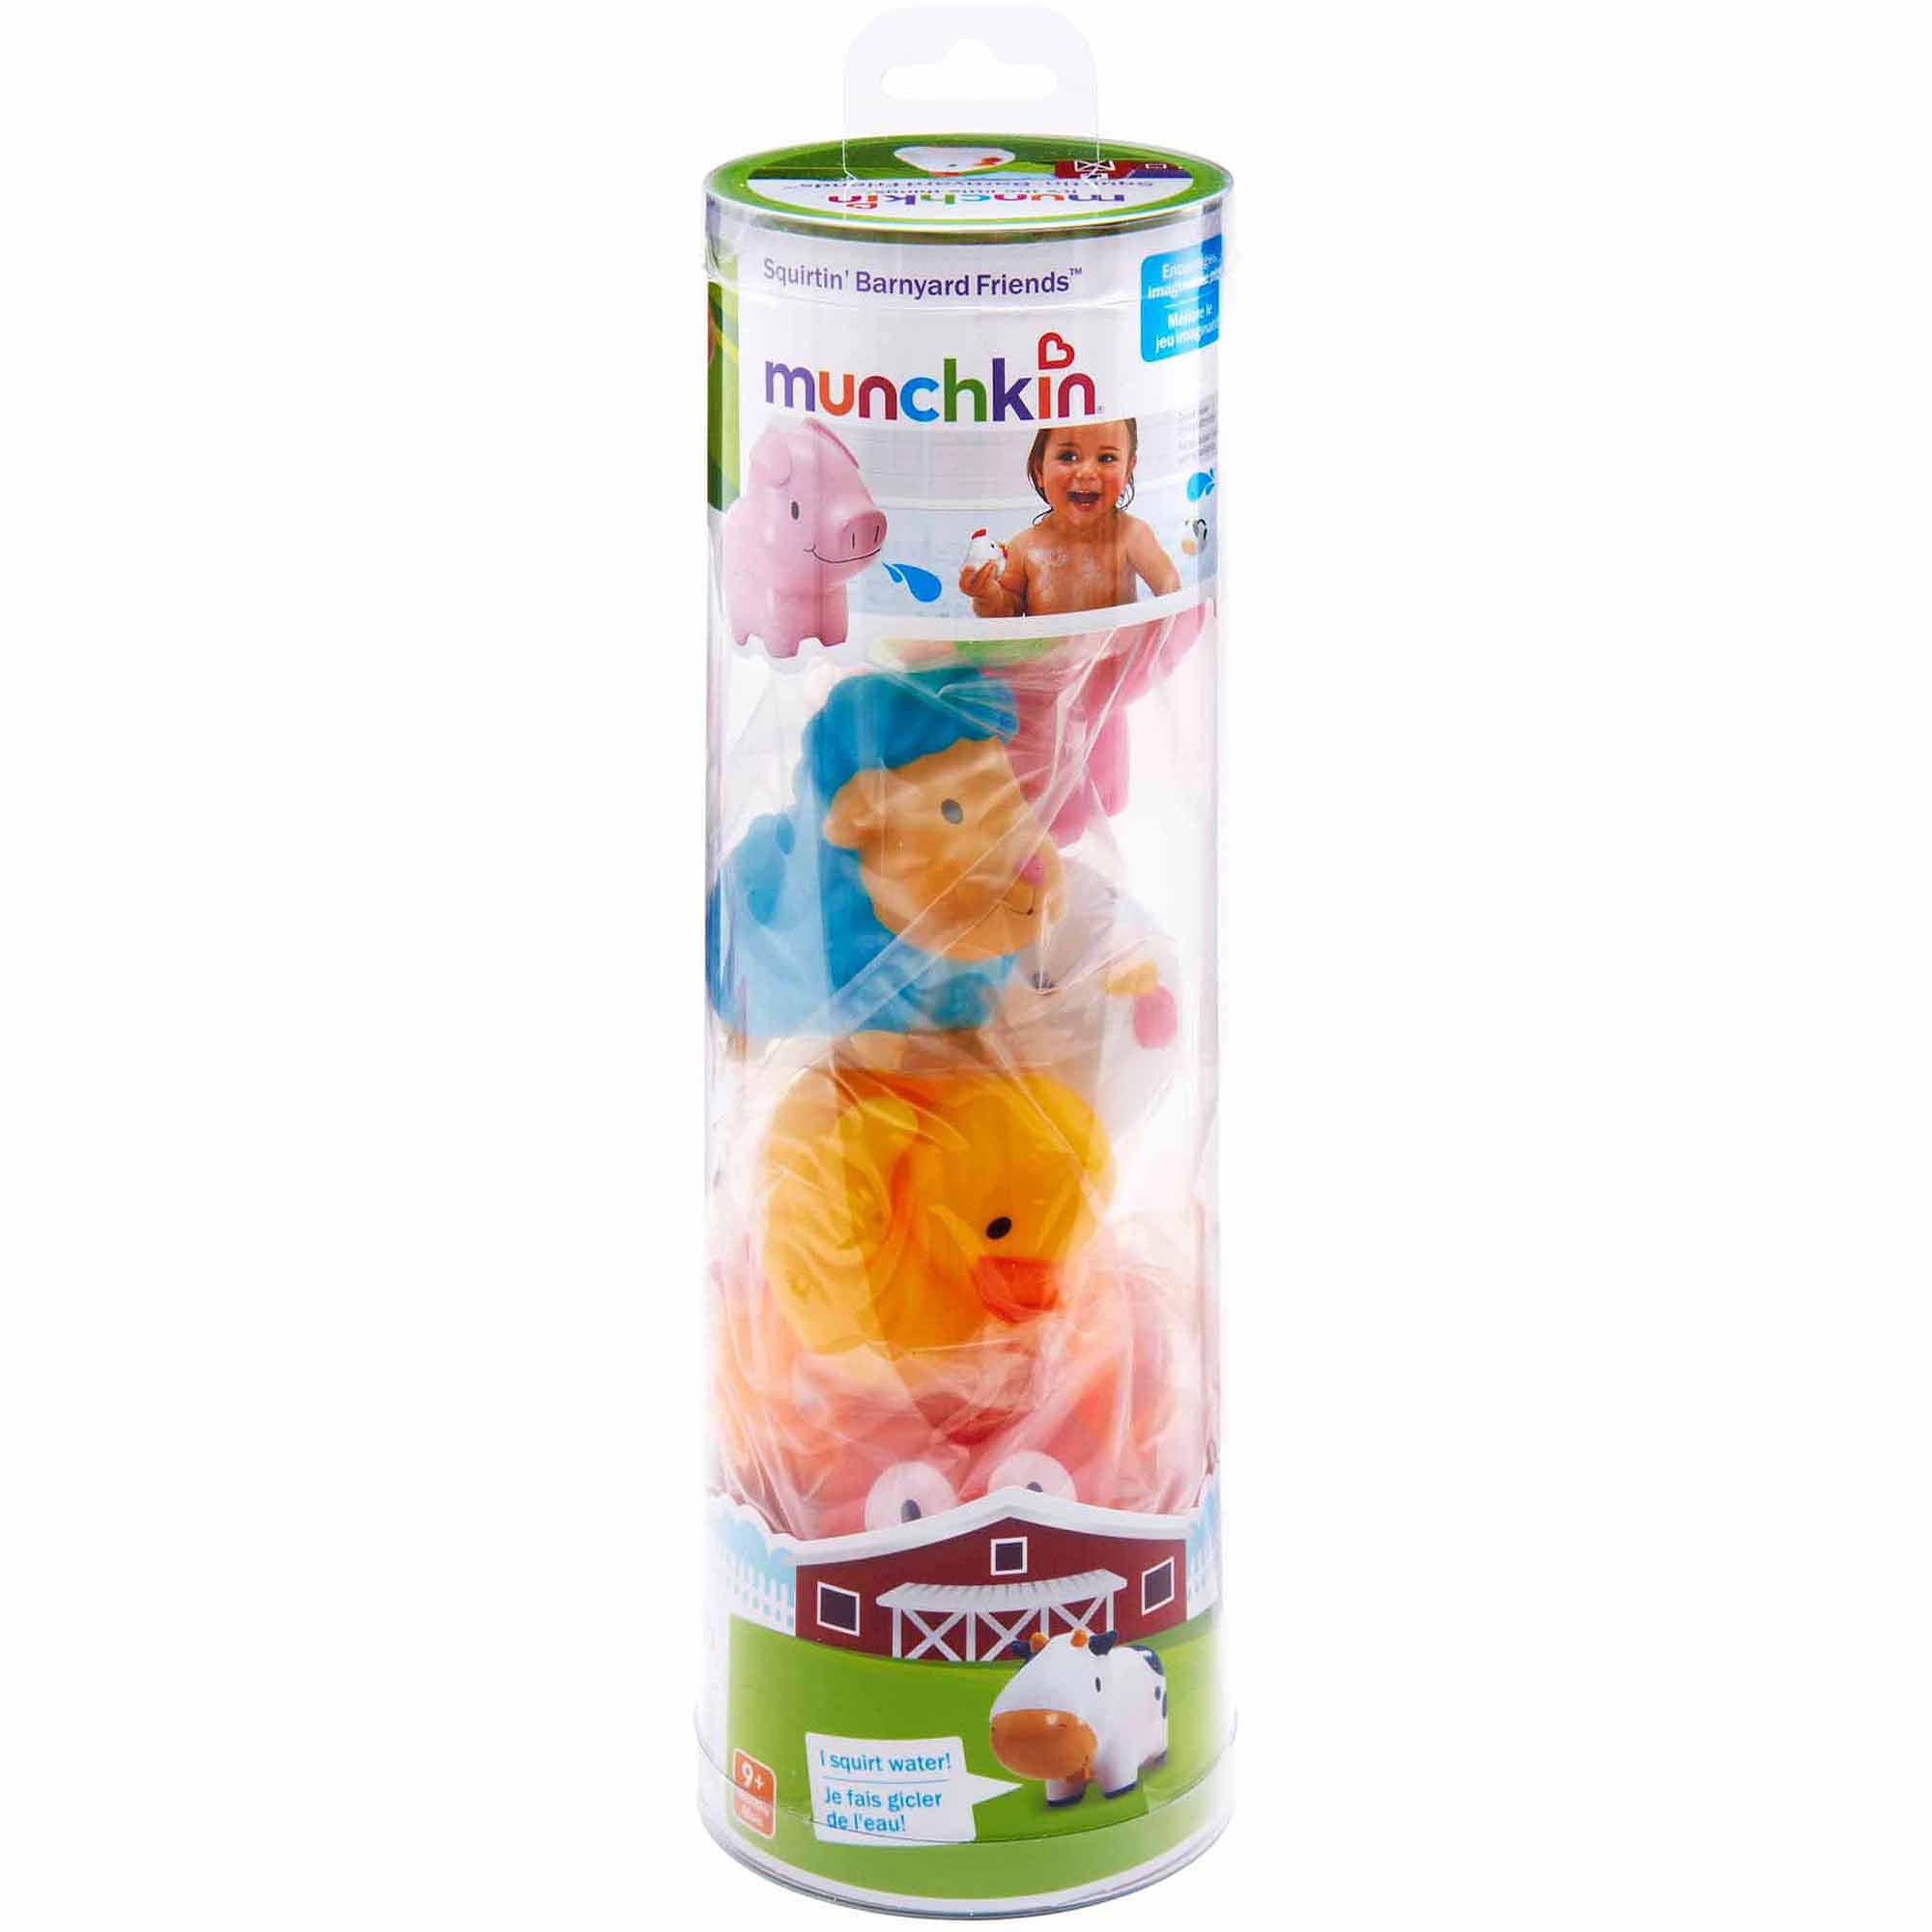 Munchkin Squirtin' Barnyard Friends, 8-Pack